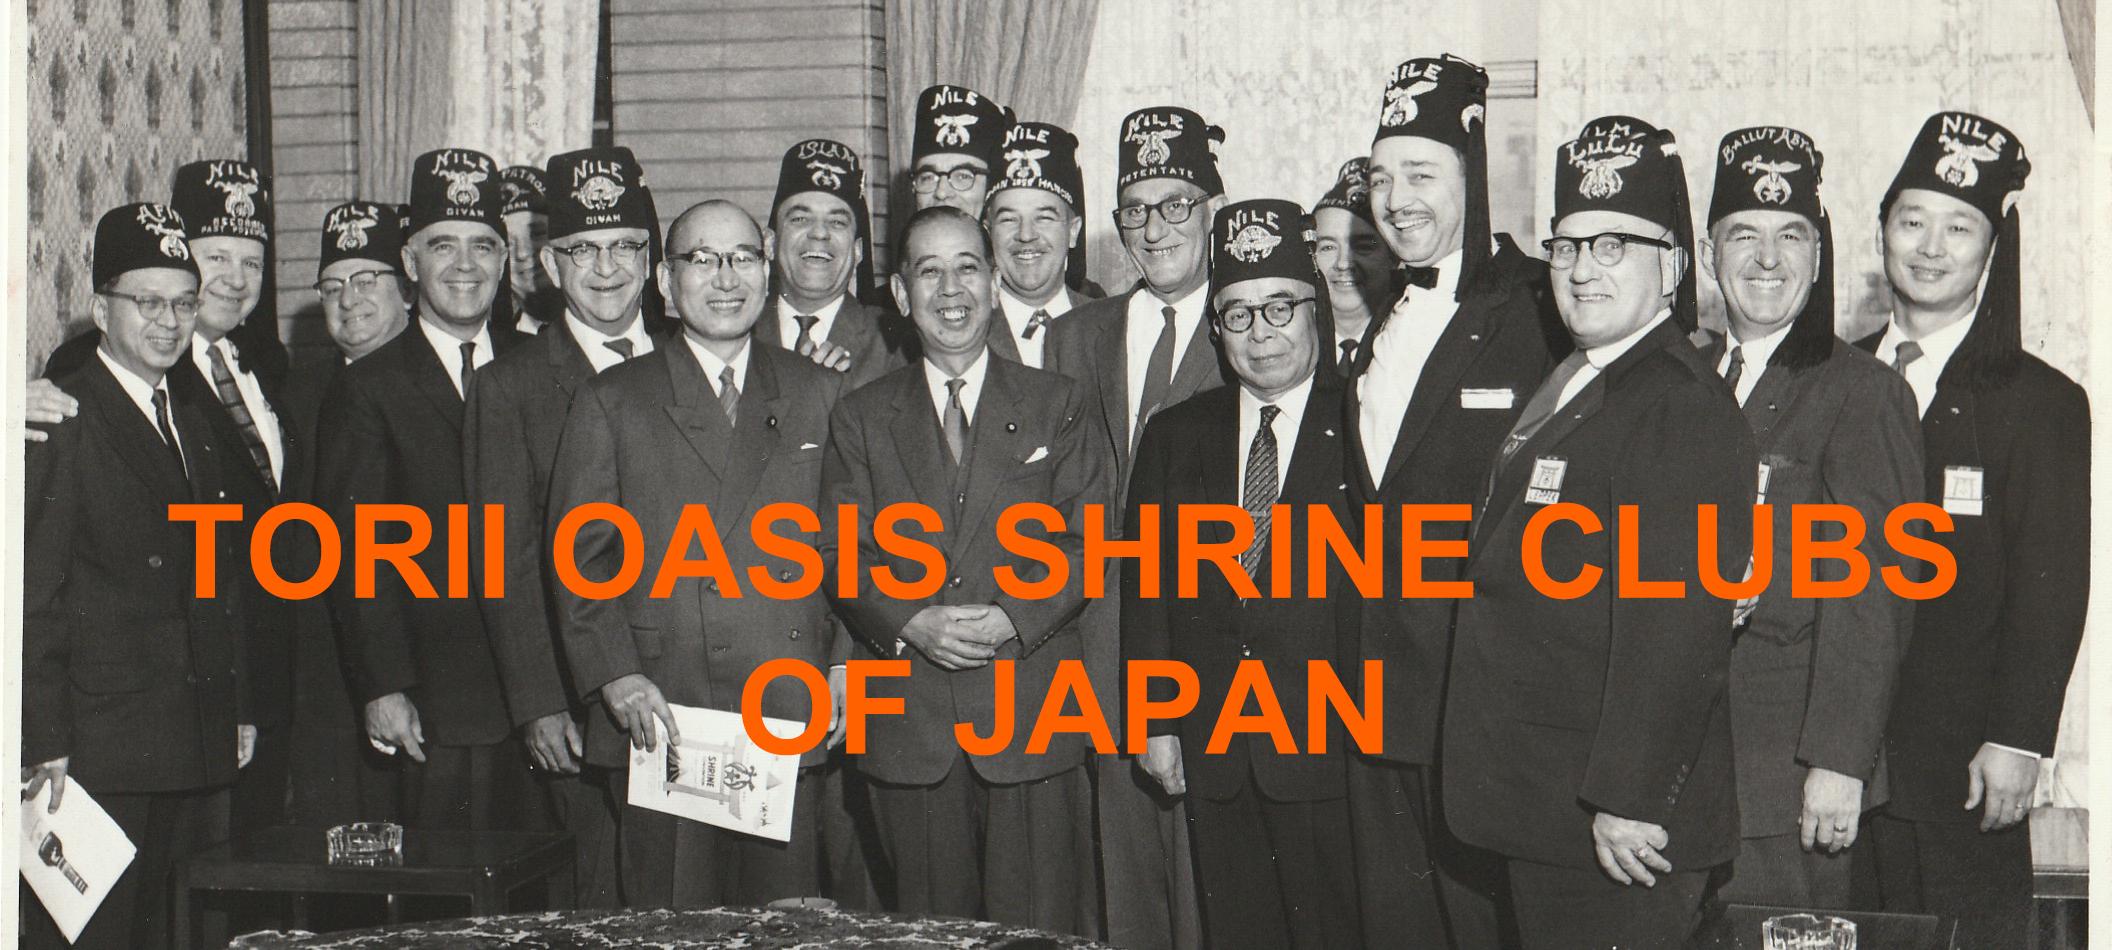 TORII OASIS SHRINE CLUBS OF JAPAN